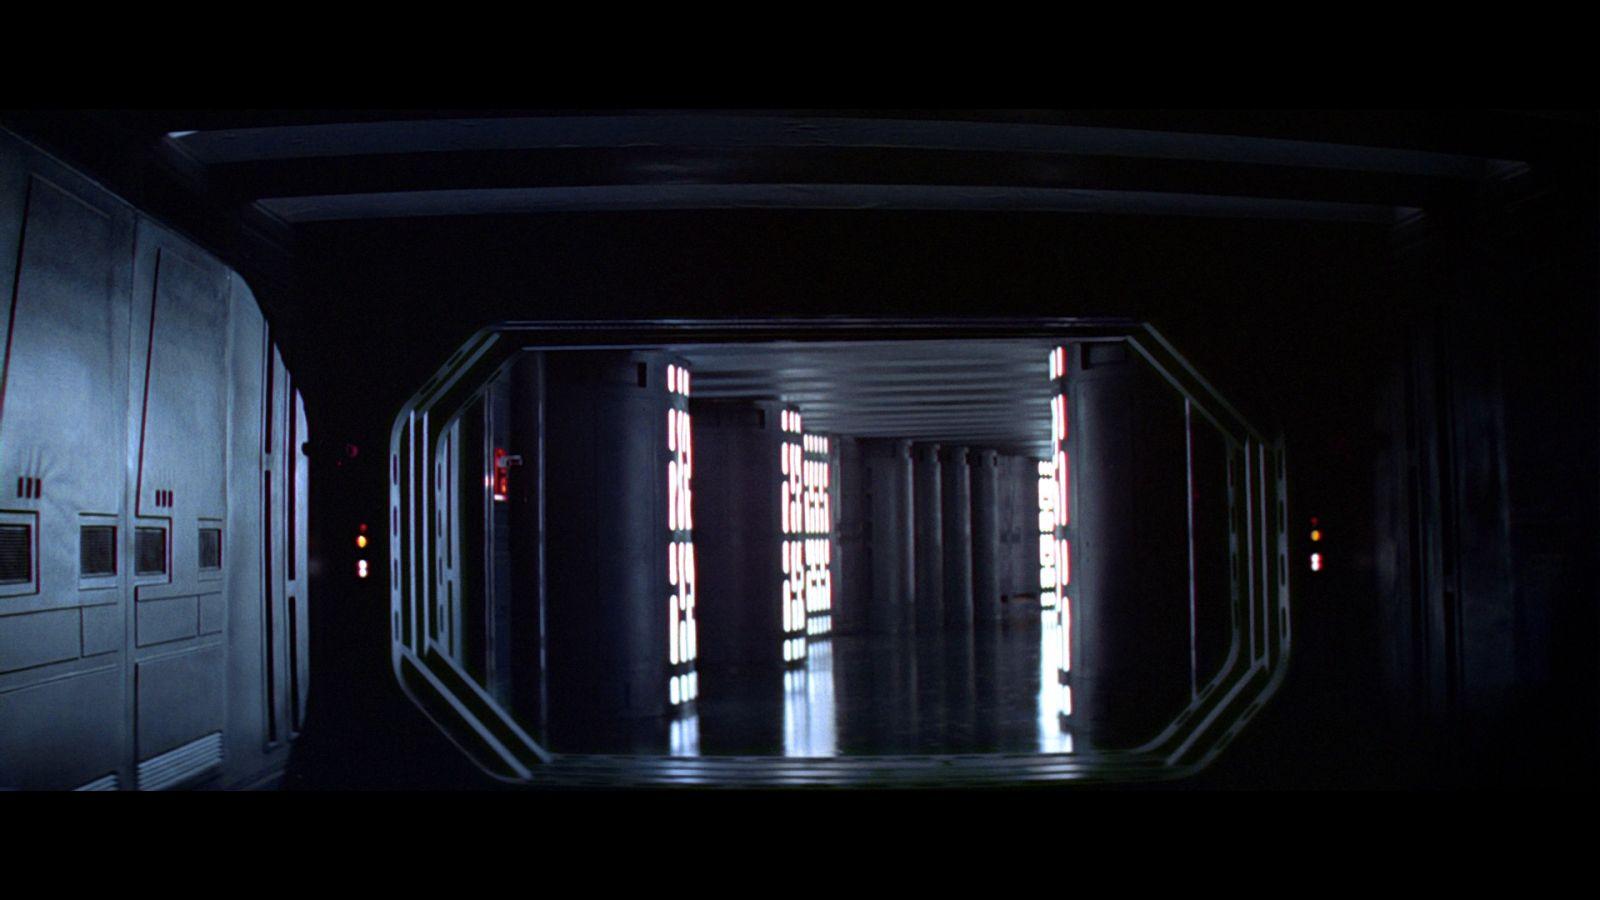 Star Wars A New Hope Bluray Capture 03-25.jpg